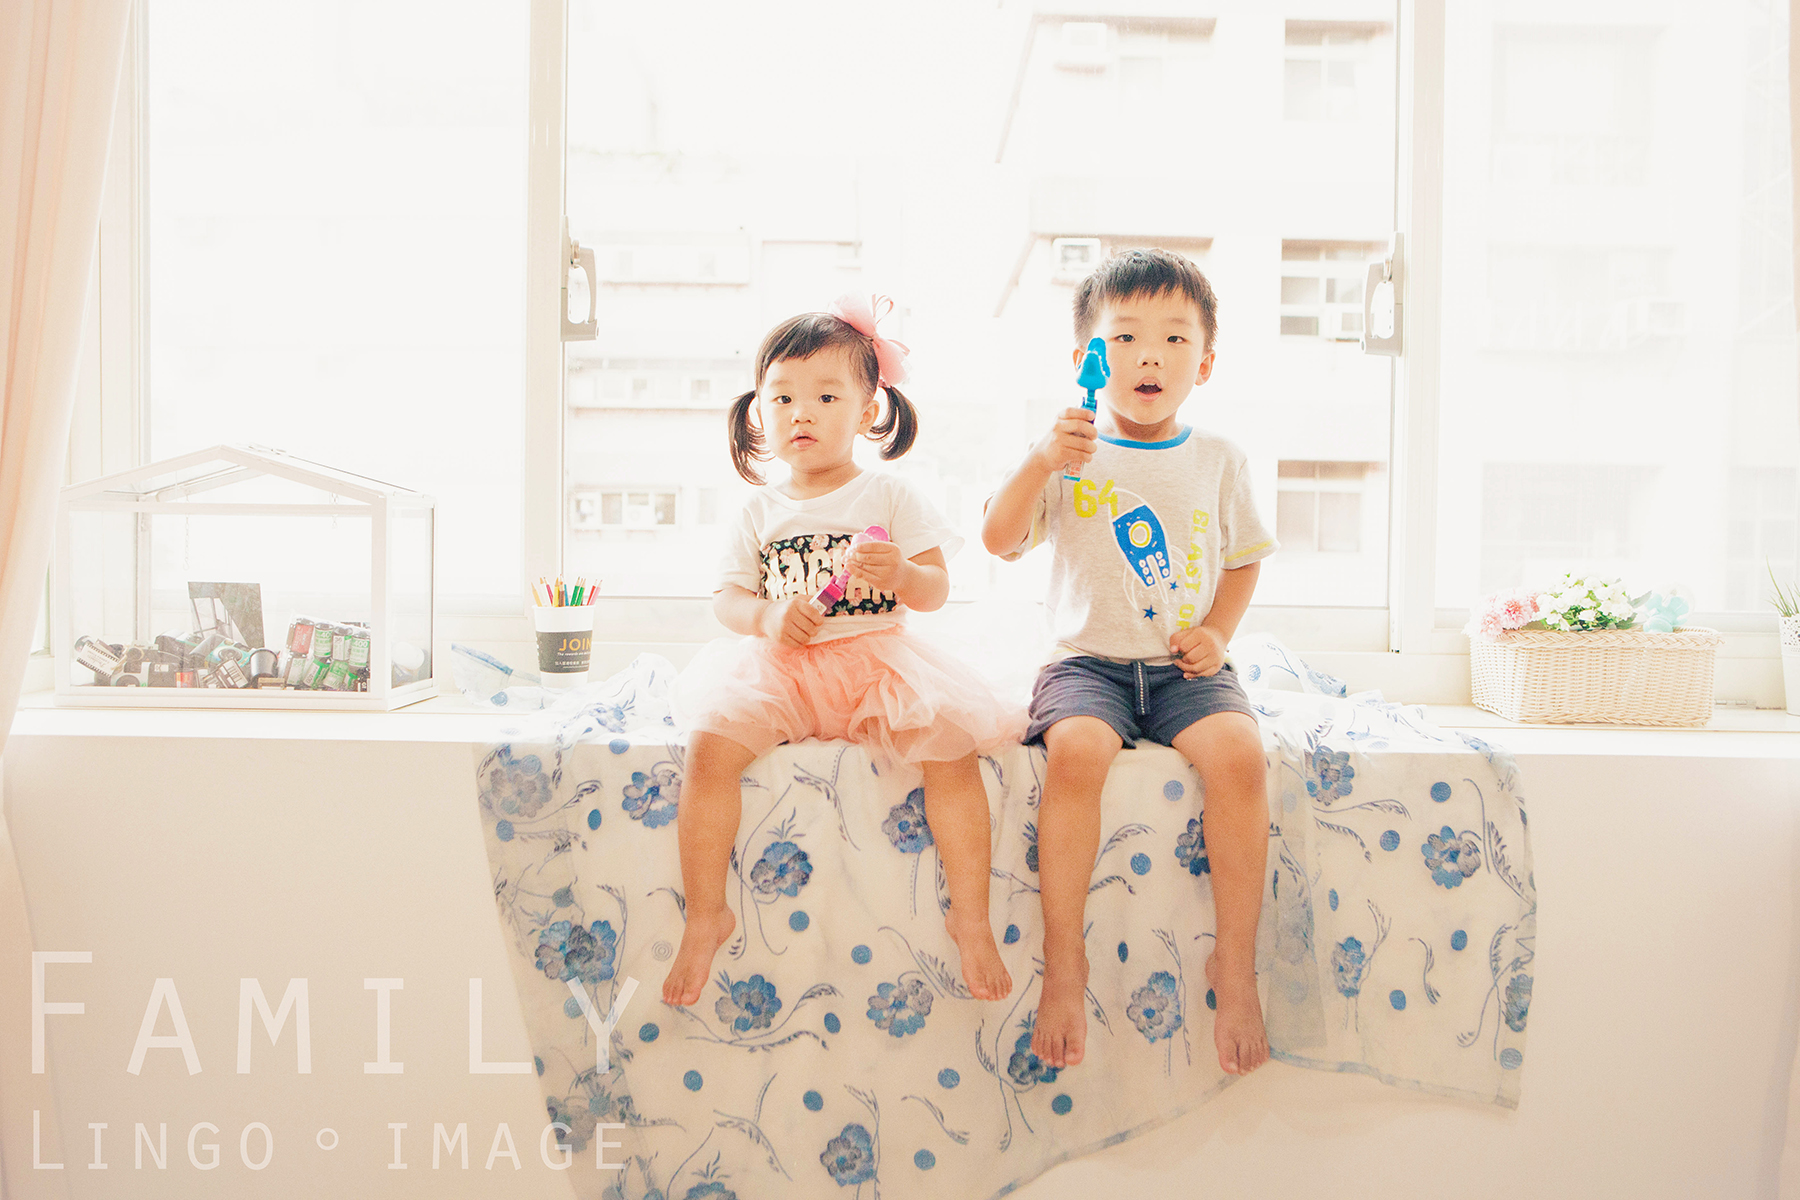 Lingo image_親子孕婦19